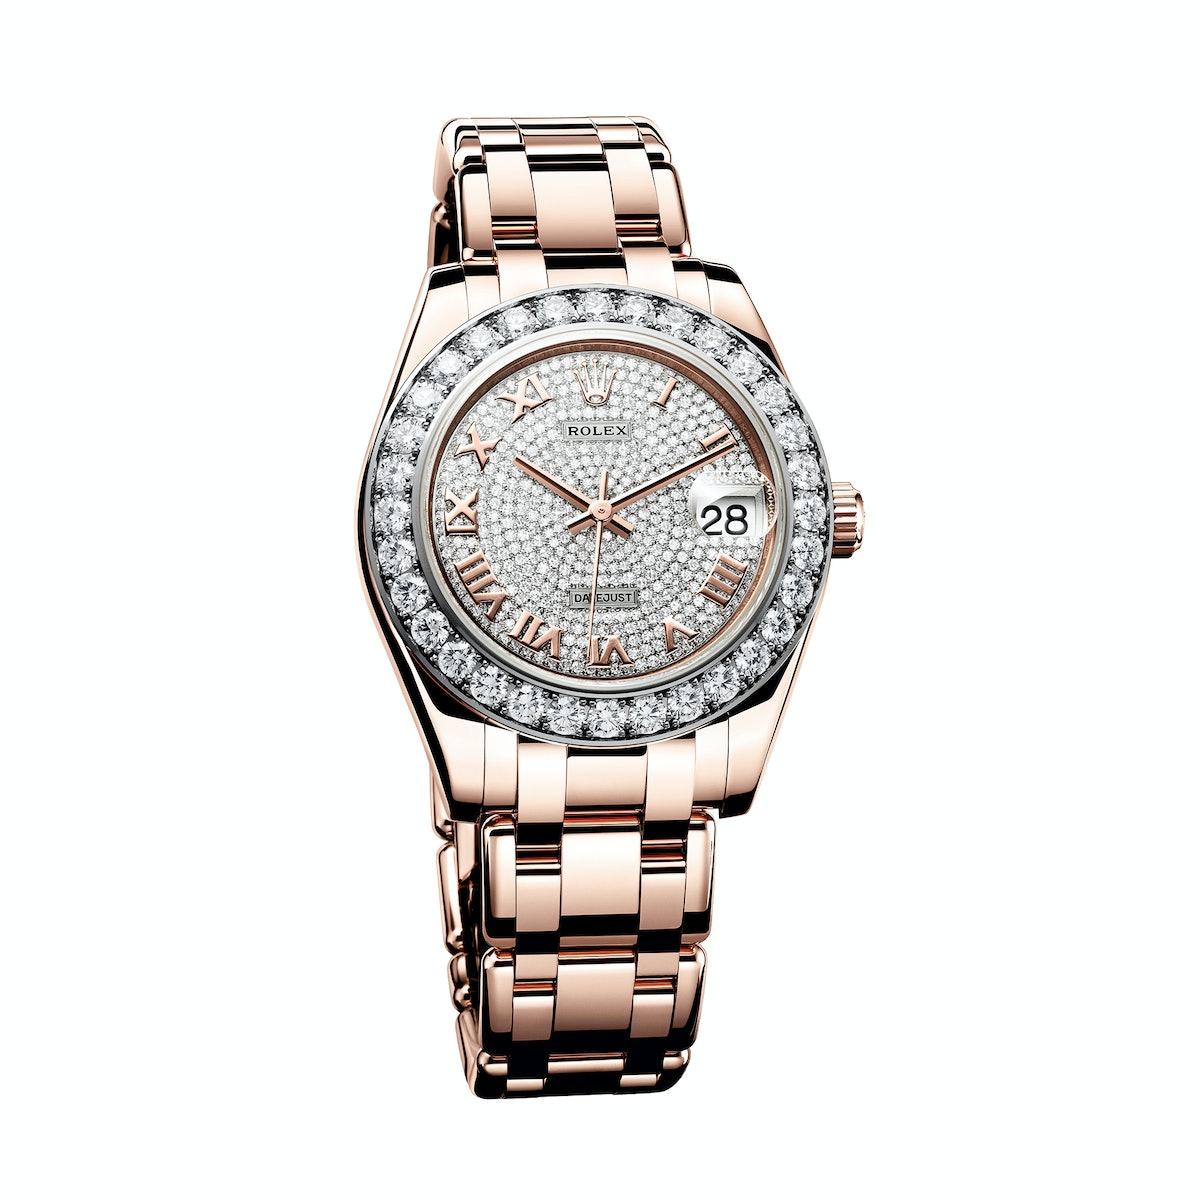 Rolex gold and diamond watch